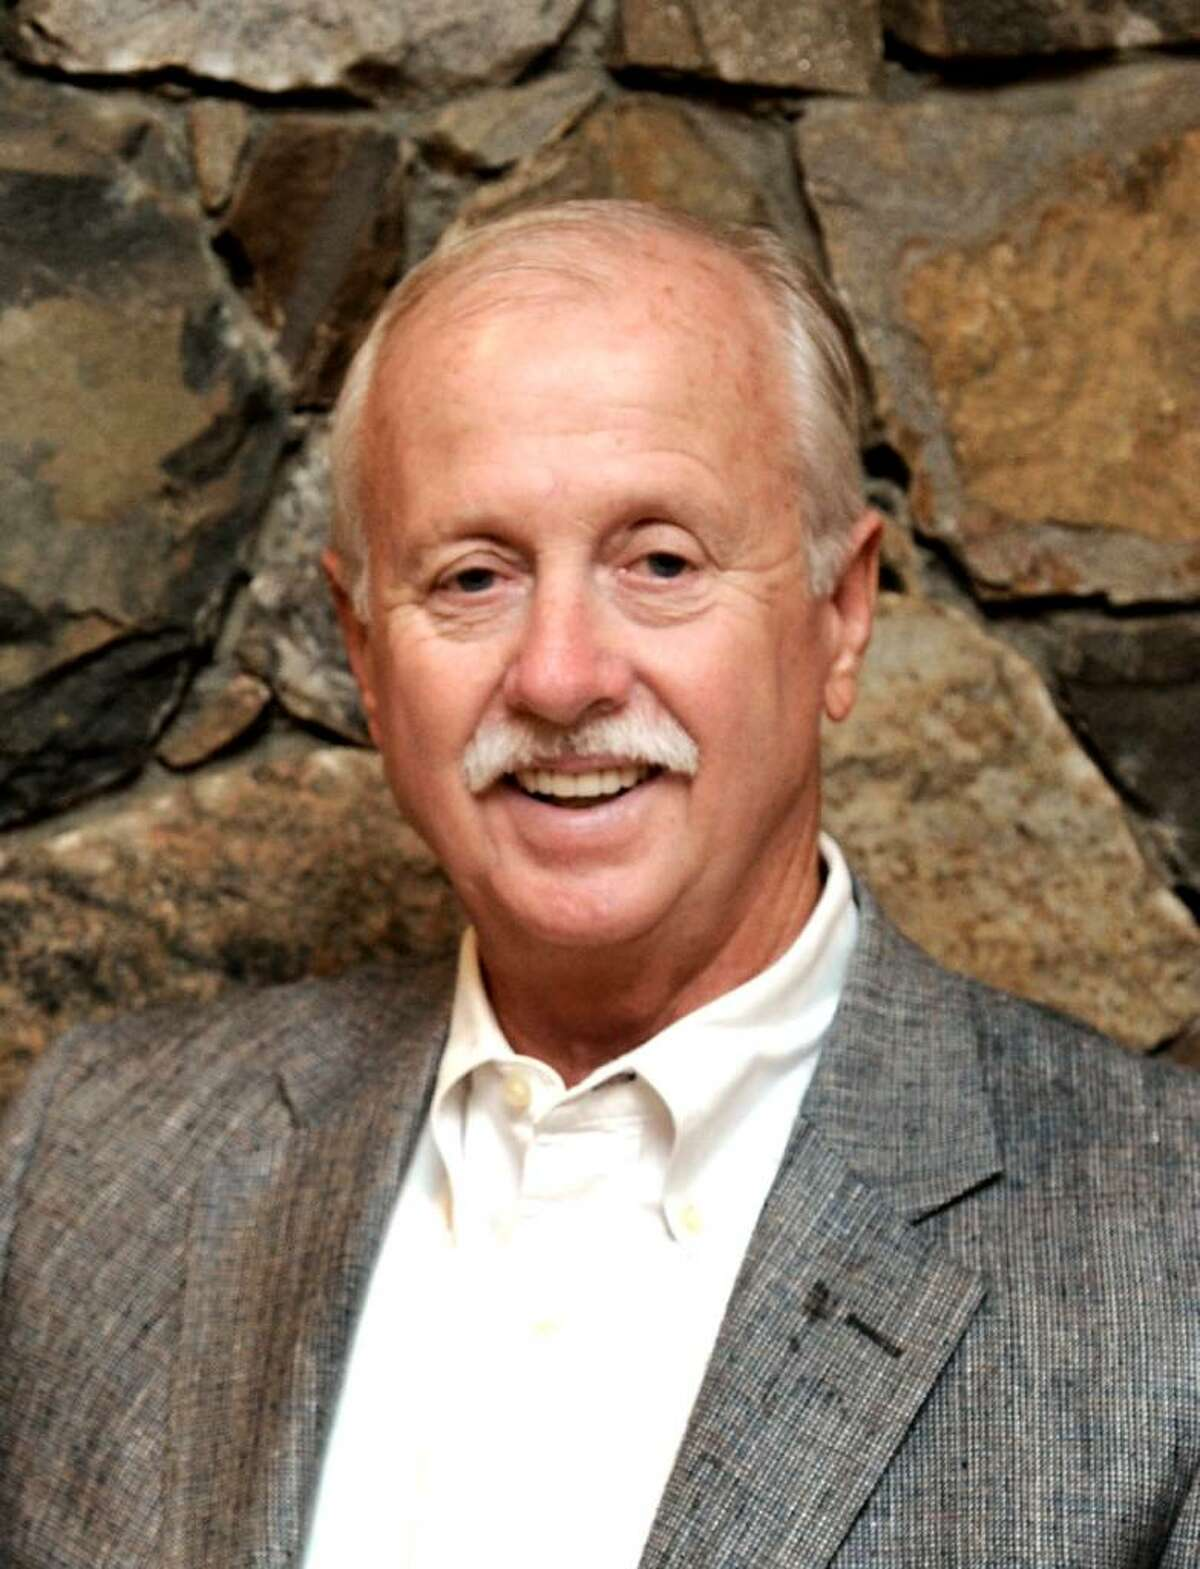 Joseph Sullivan, president,MCCA, Inc. in his Danbury offices on friday.